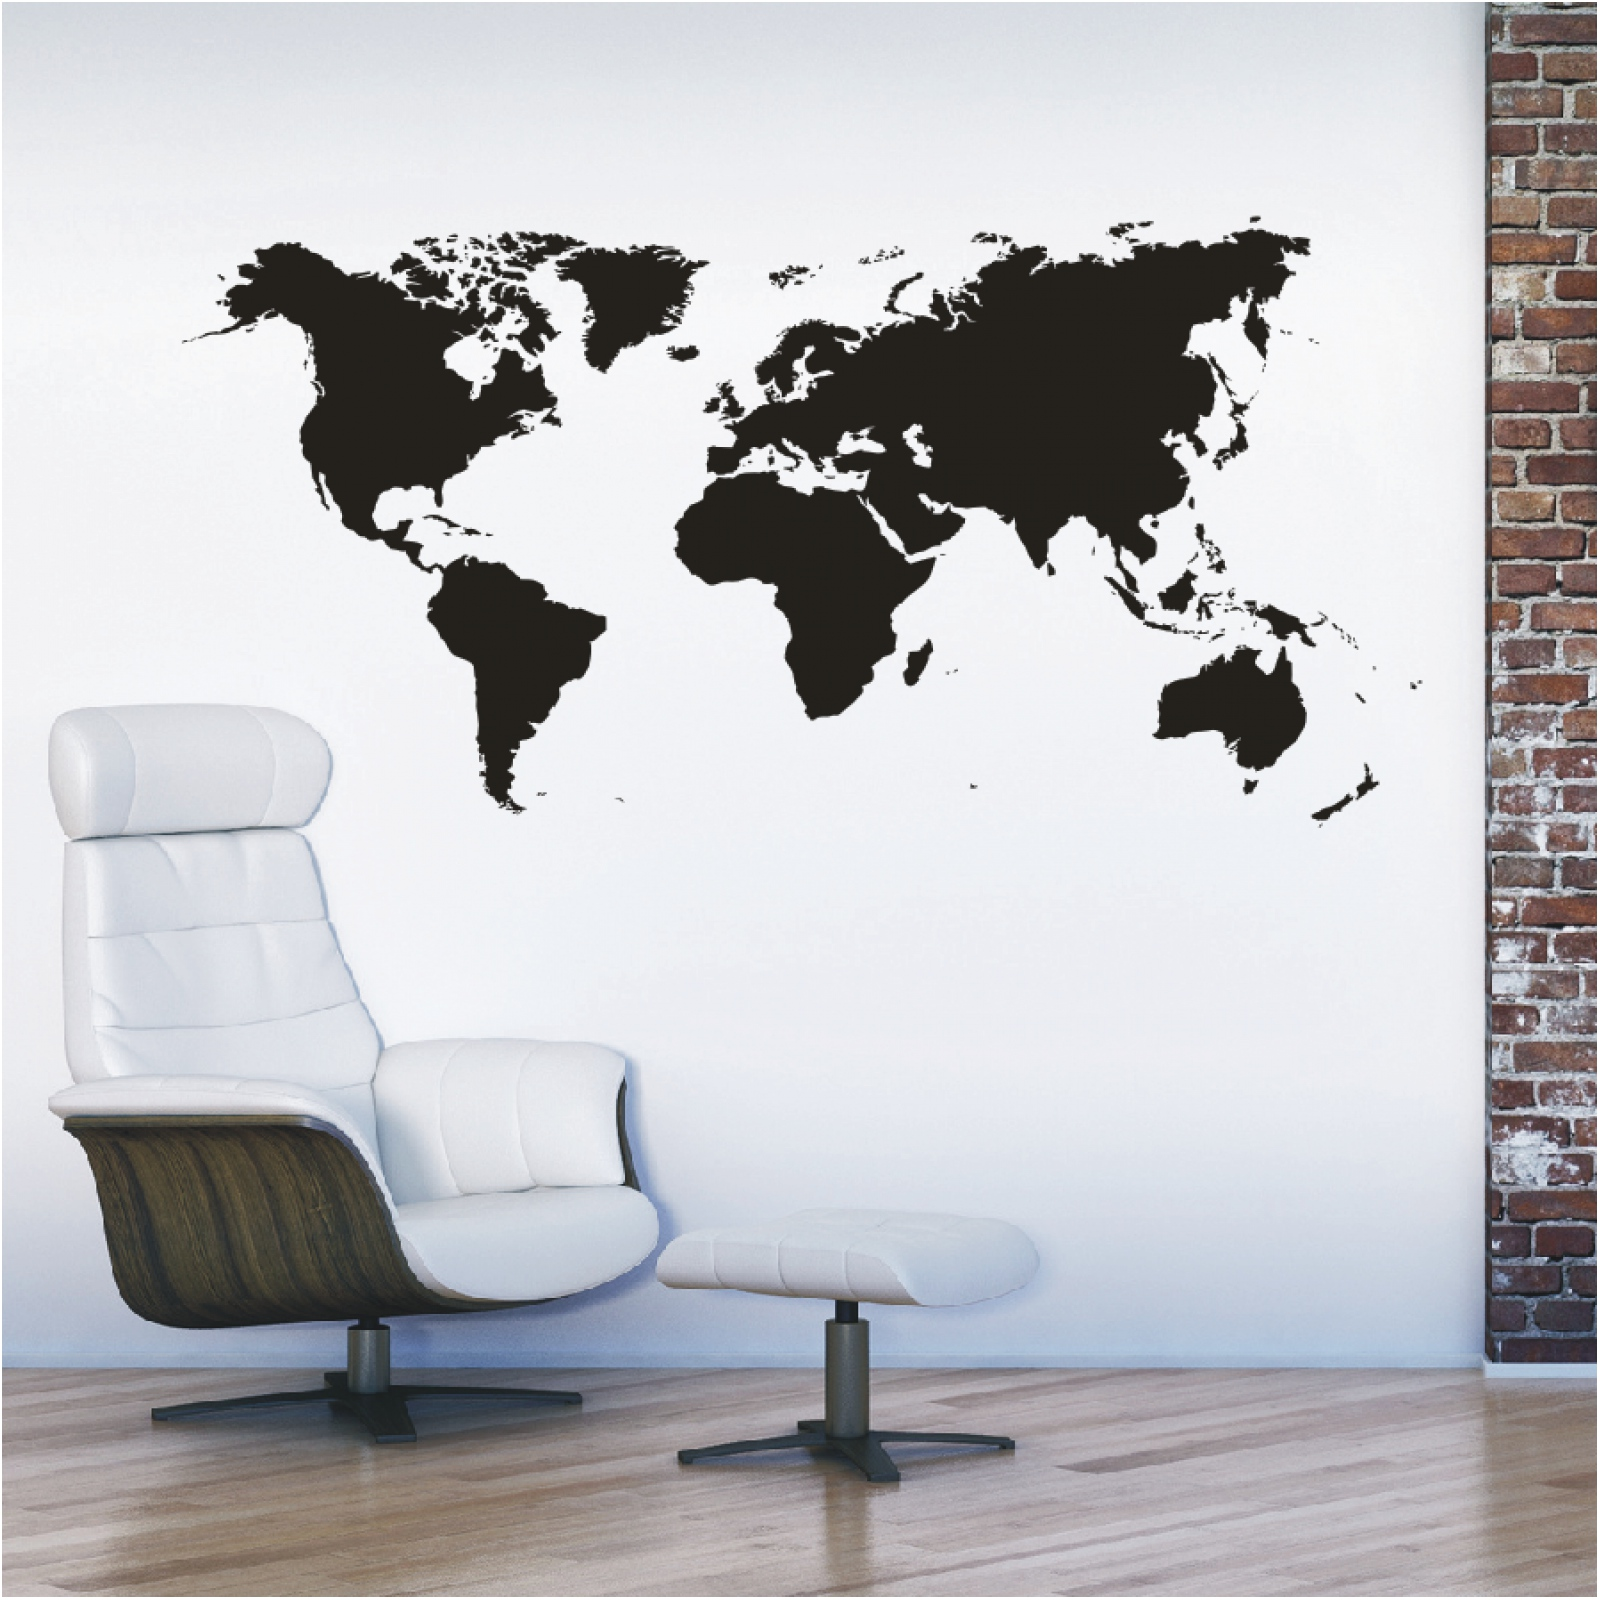 L111 landkarte wandtattoo kontinente weltkarte welt - Wandtattoo welt ...